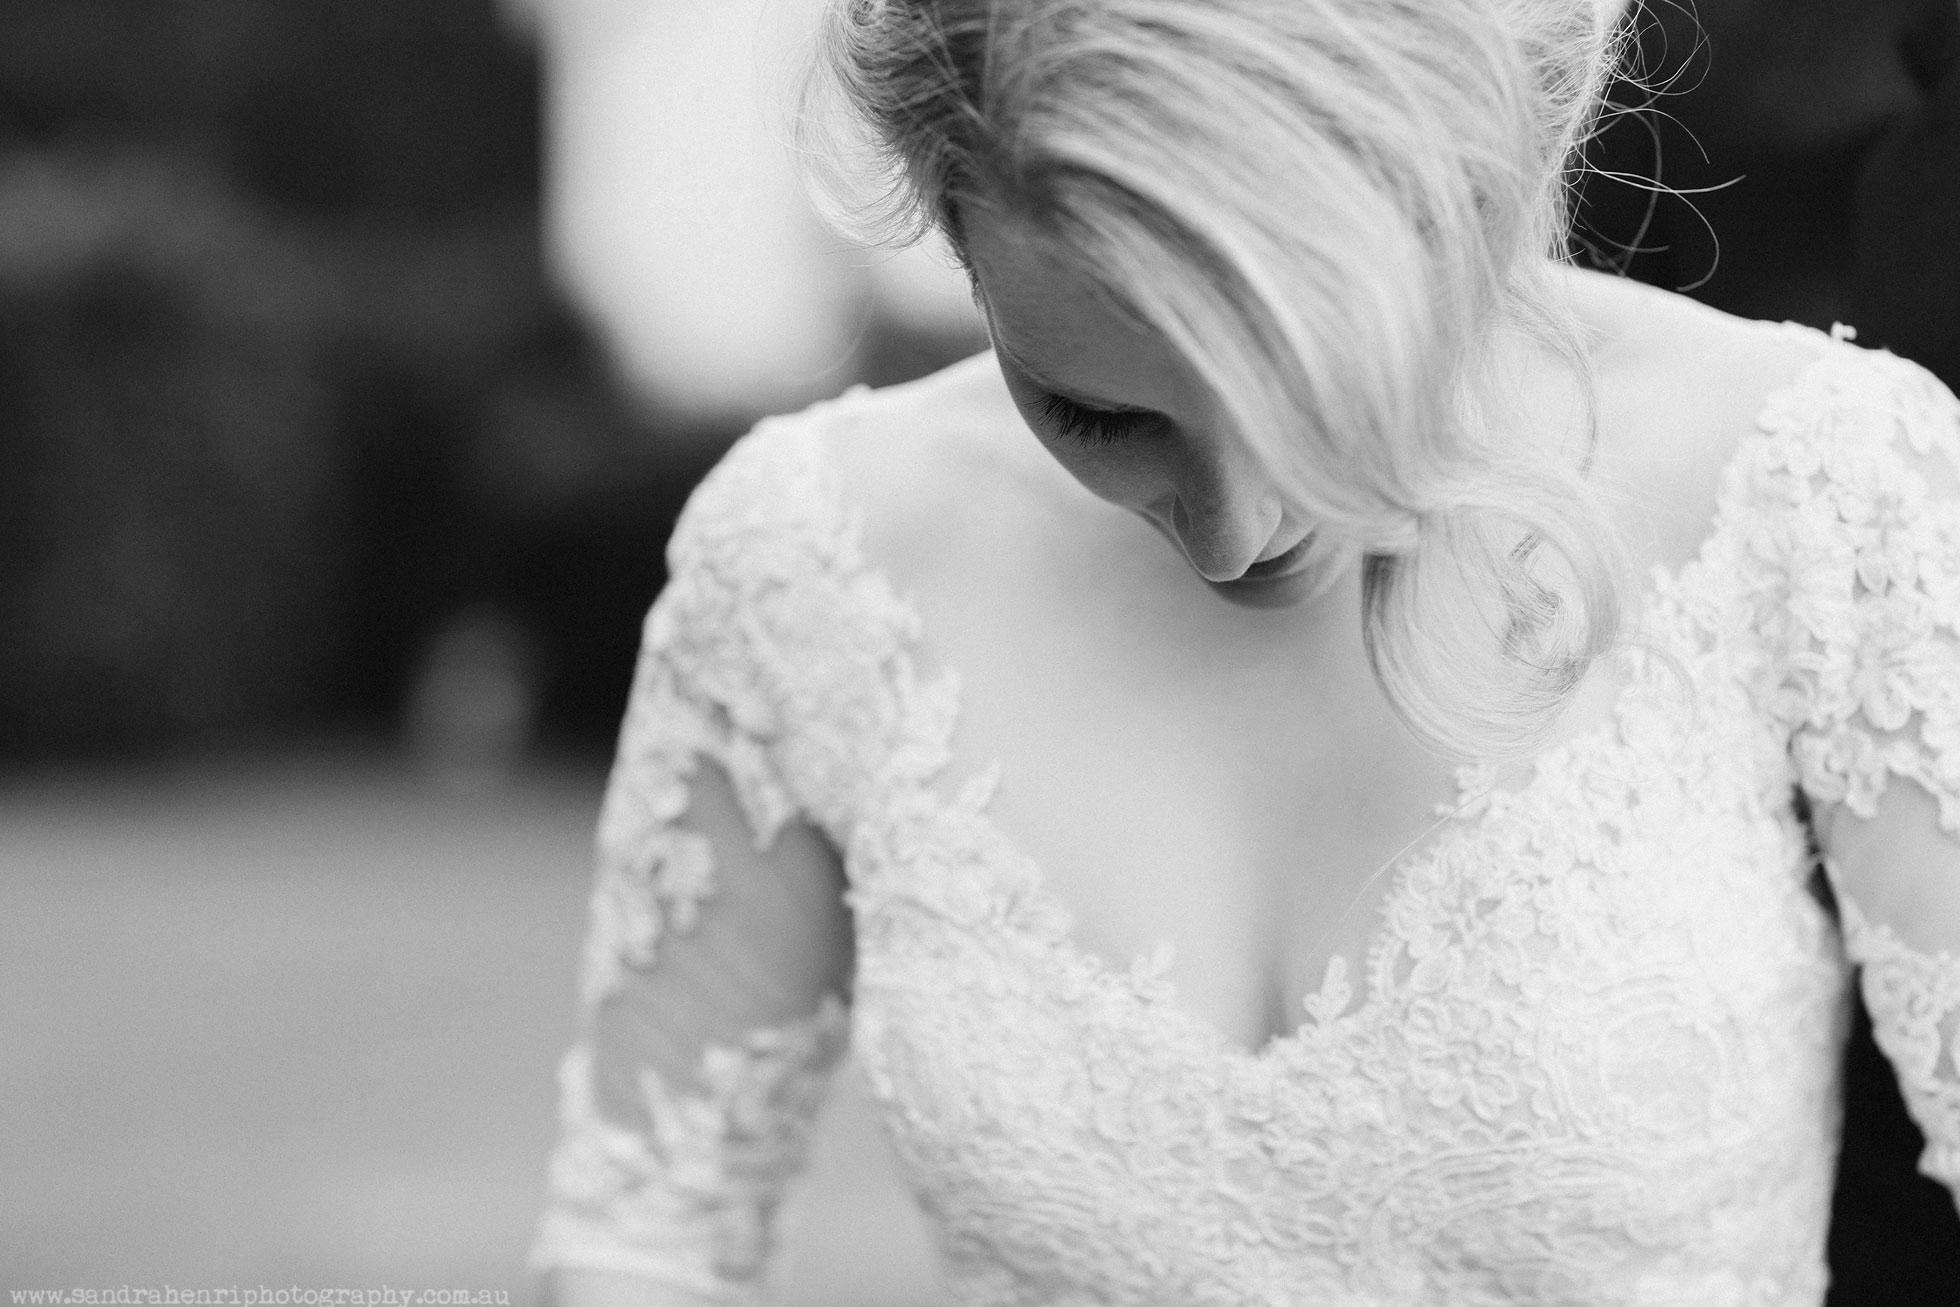 Roberts-Restaurant-garden-wedding-images-36.jpg